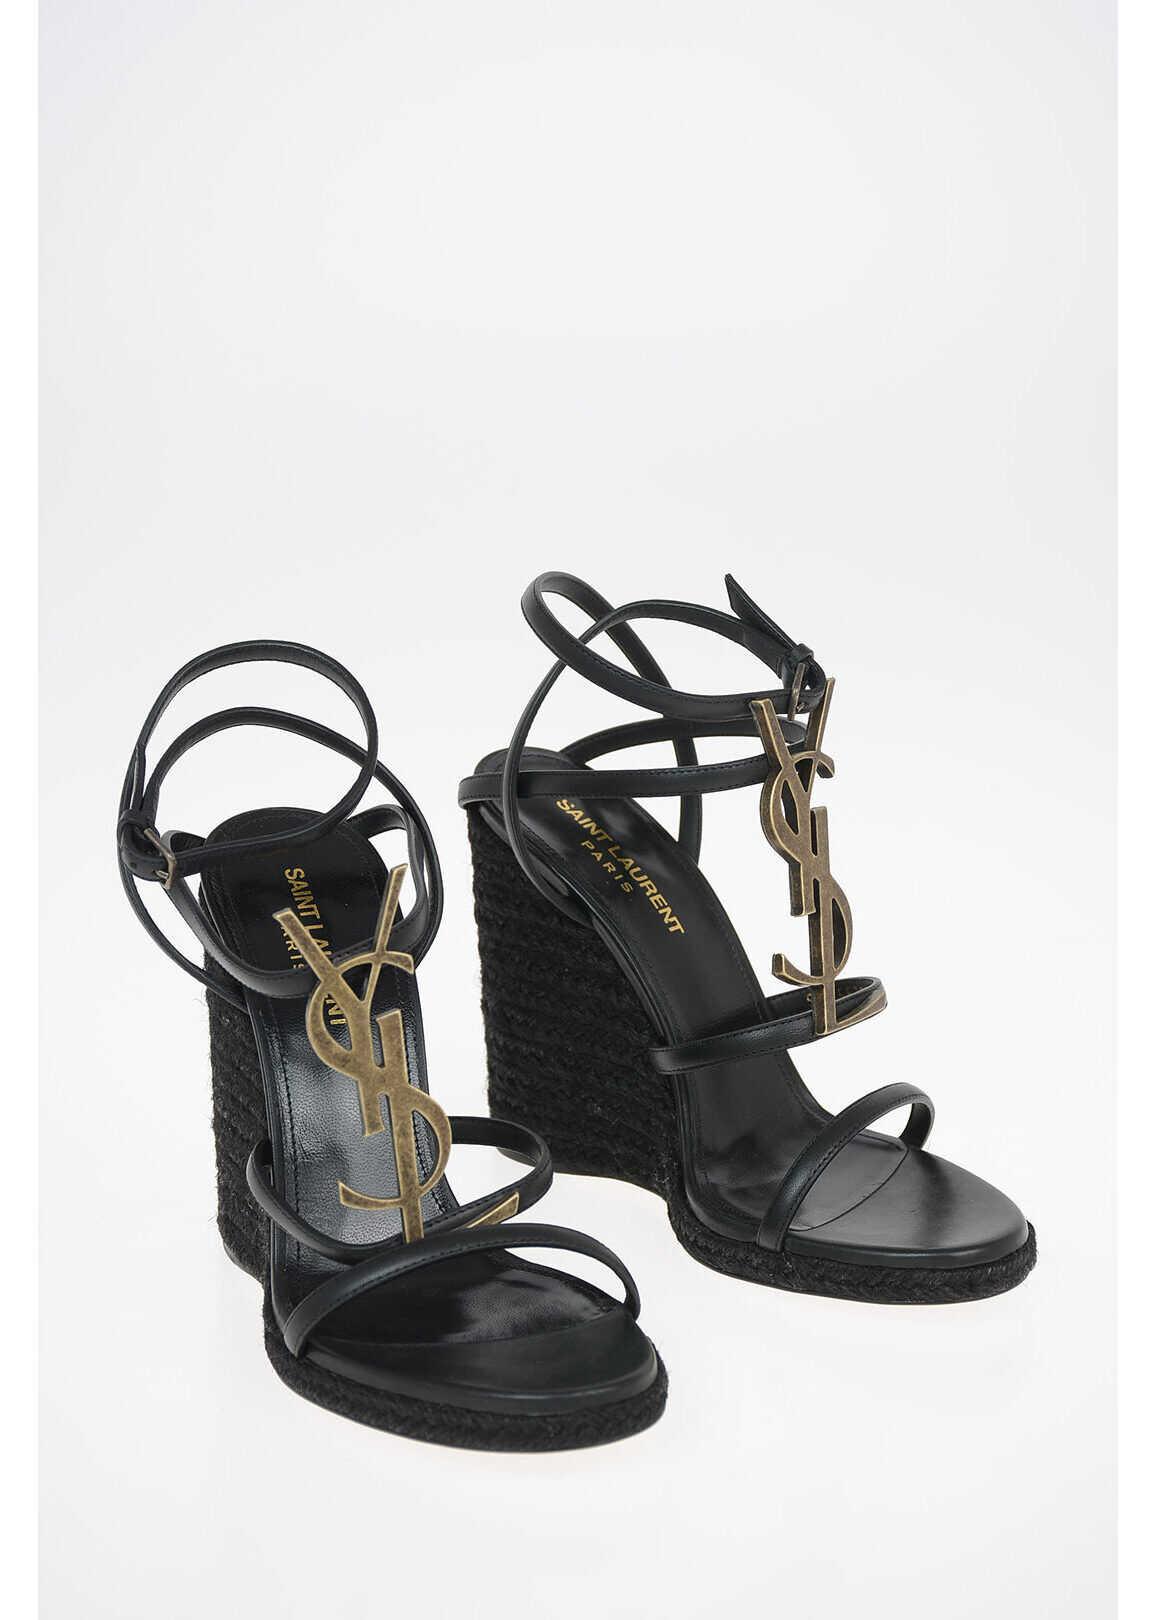 Saint Laurent Leather CASSANDRA Sandals with Platform Sole 11 Cm BLACK imagine b-mall.ro